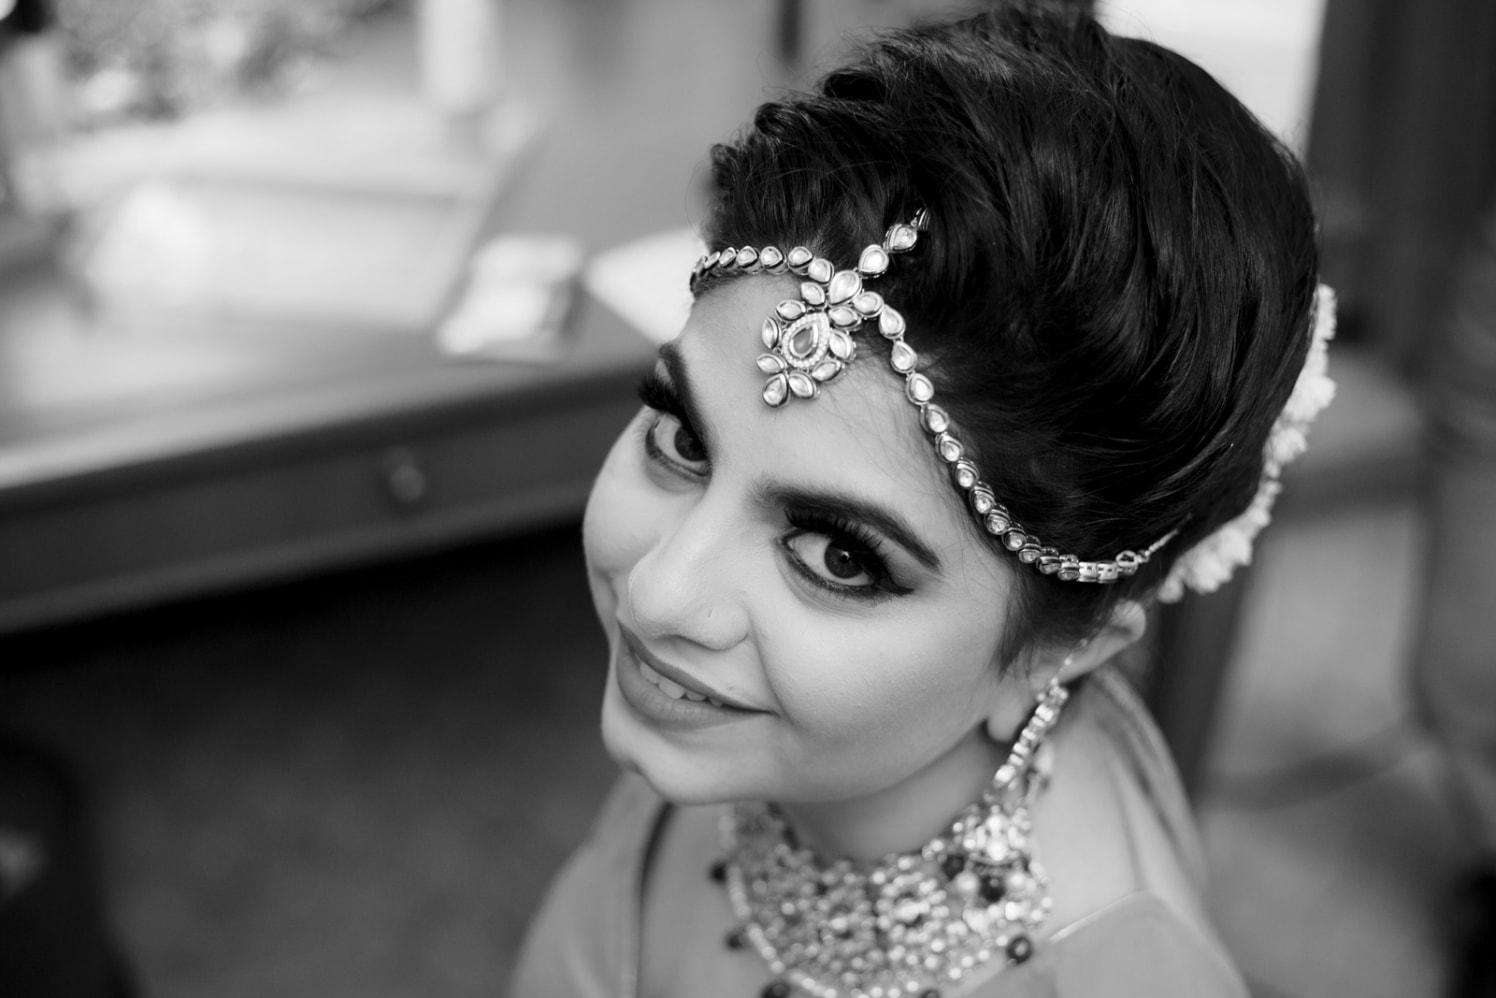 Ravishing Bride Smiling On Her Big Day by Arpit Gulati Wedding-photography | Weddings Photos & Ideas